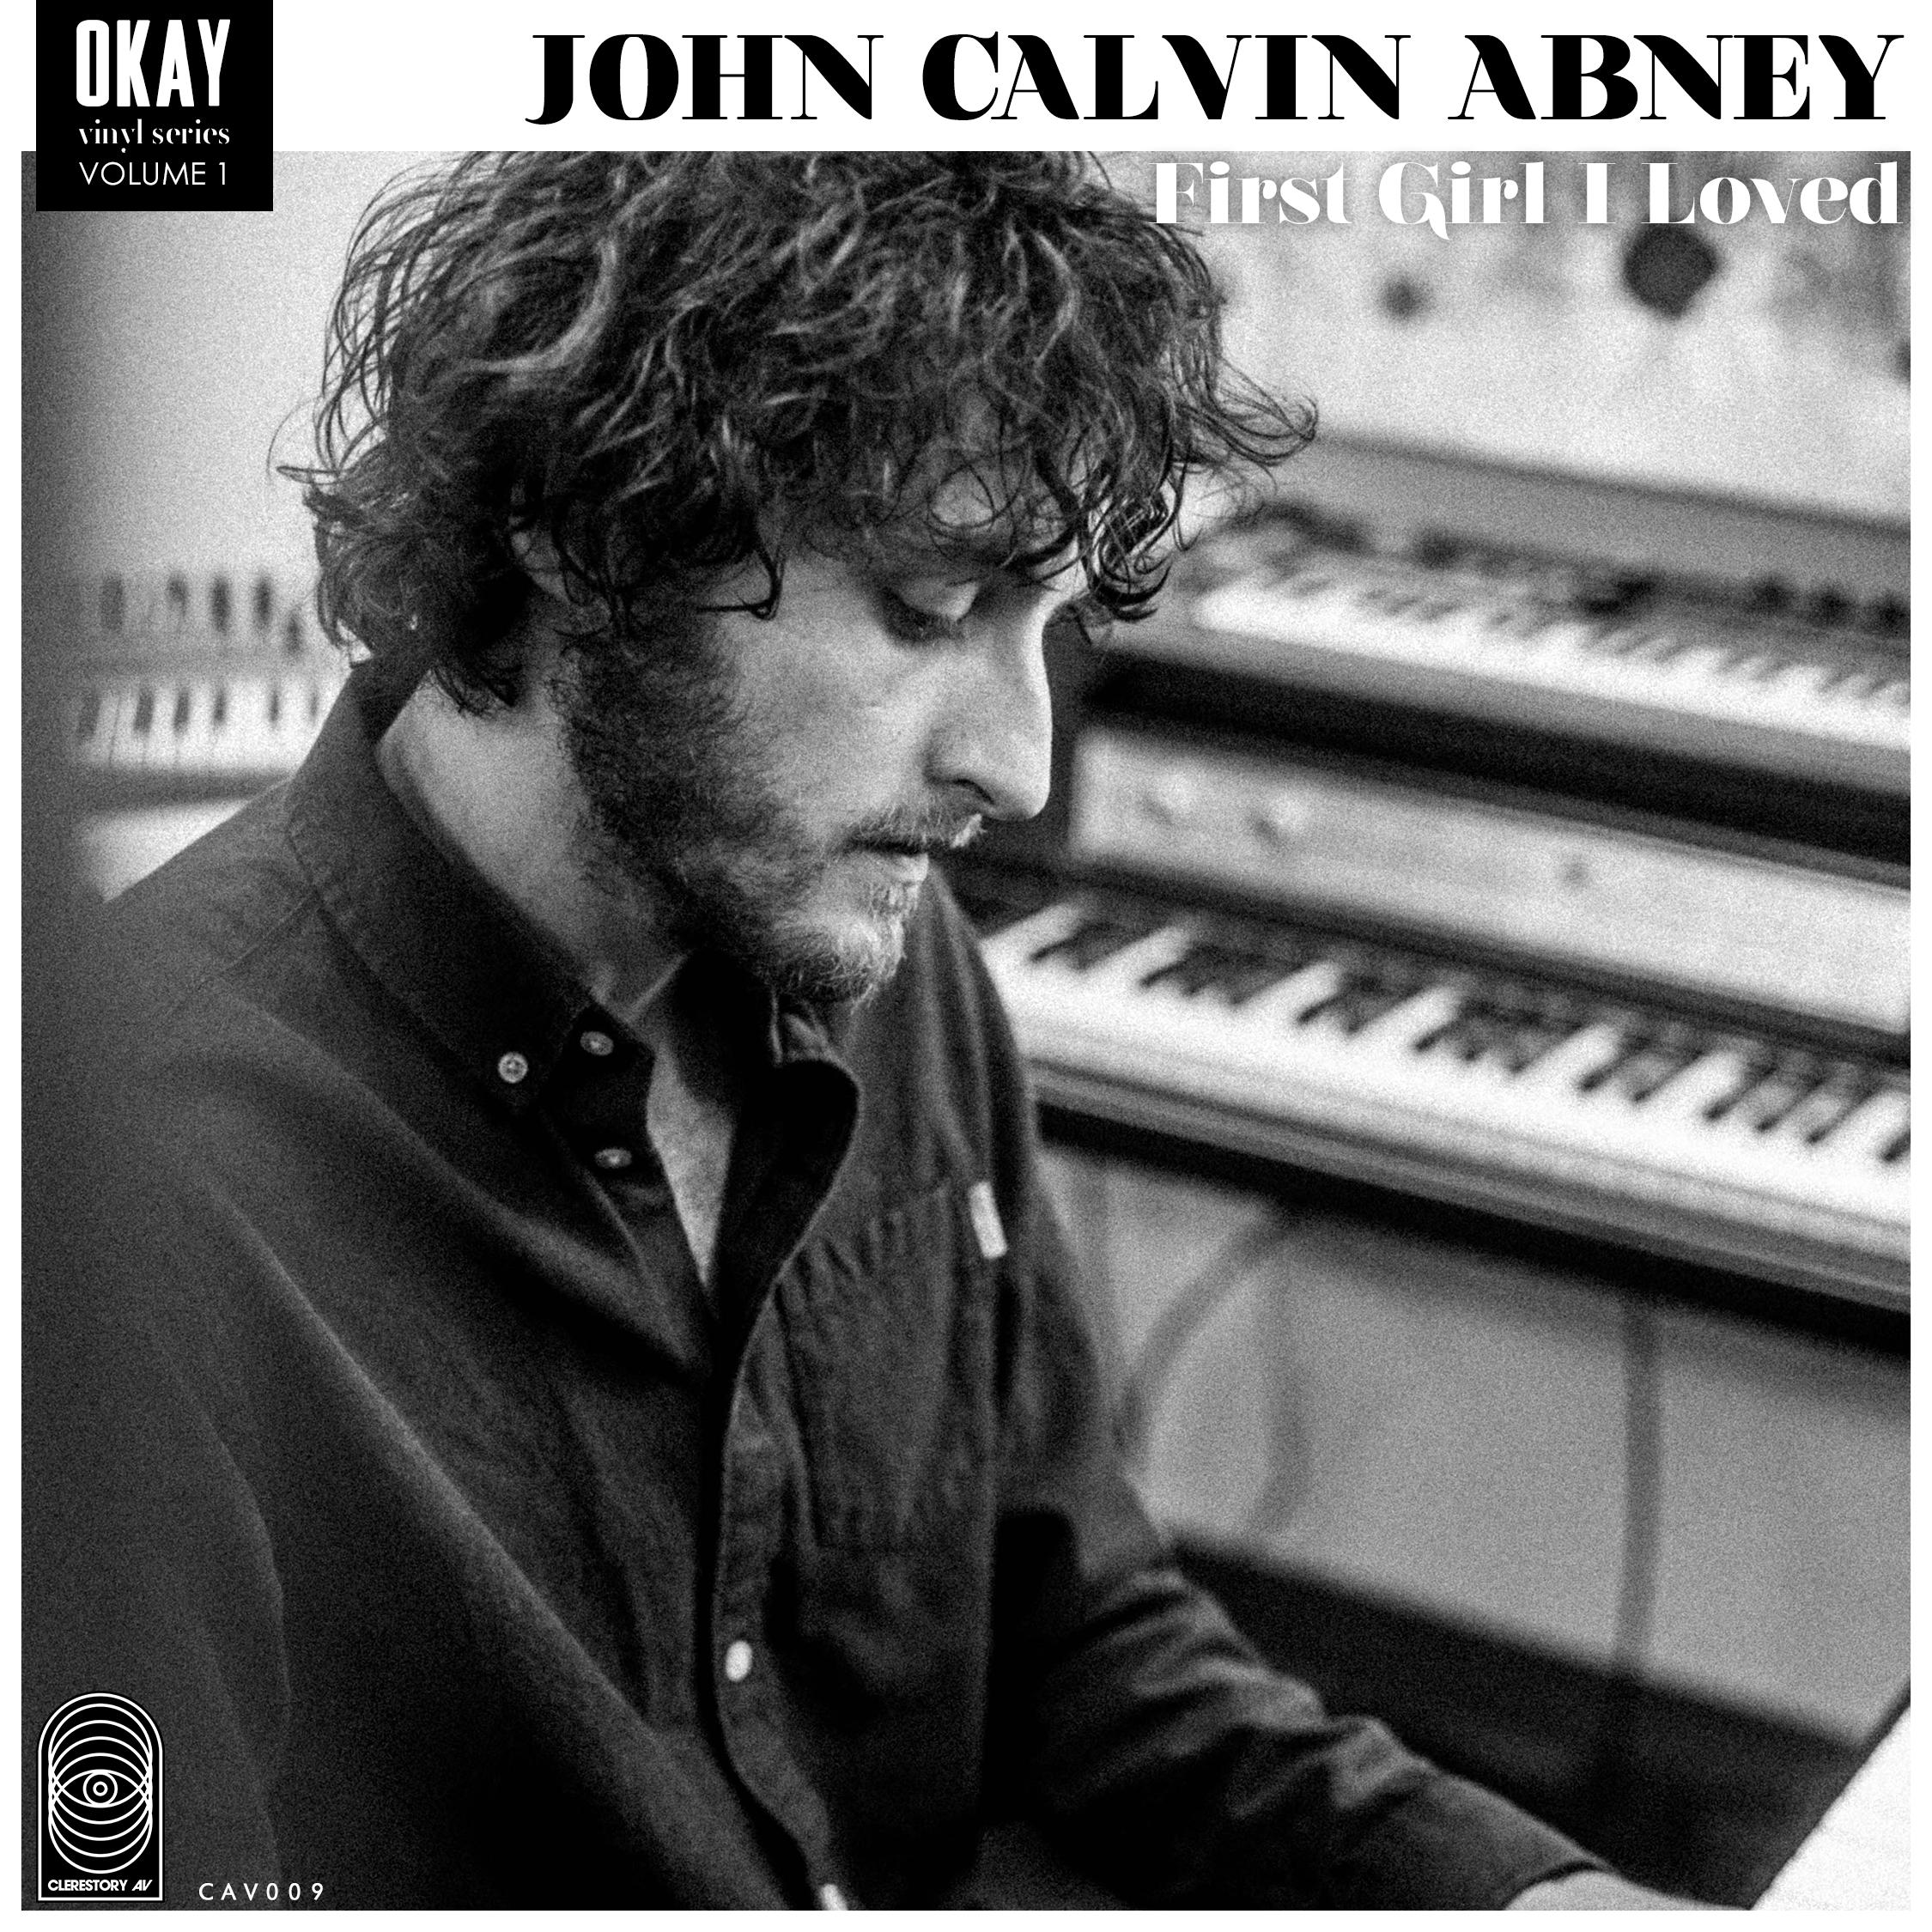 JOHN CALVIN ABNEY / OKAY Vinyl Series Vol. 1